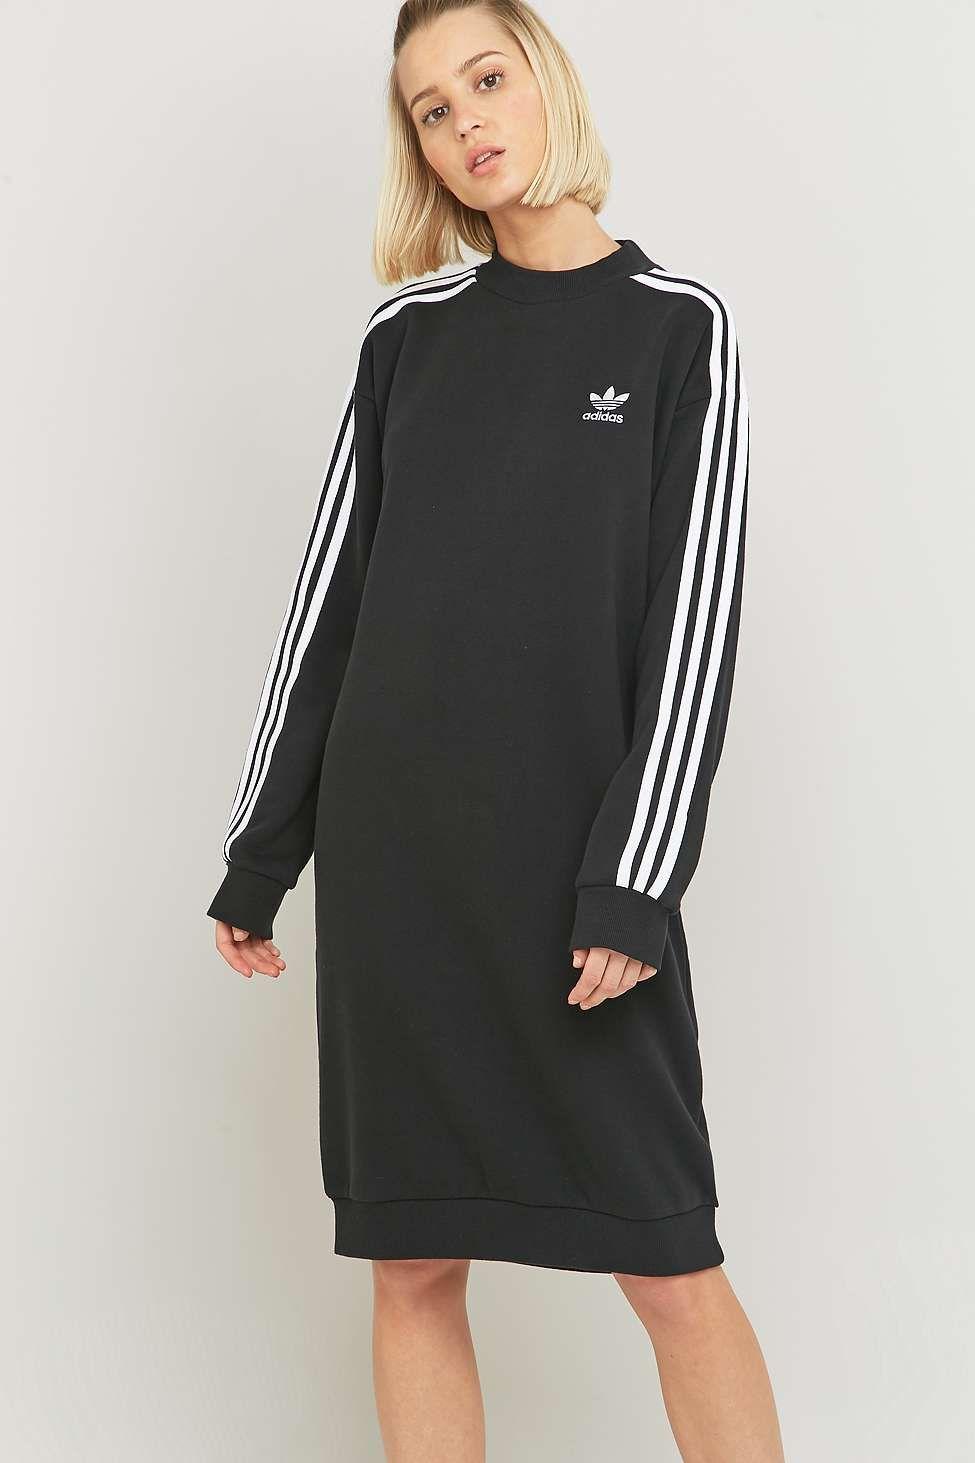 adidas Originals 3 Stripe Black Midi Dress   Robe noire mi